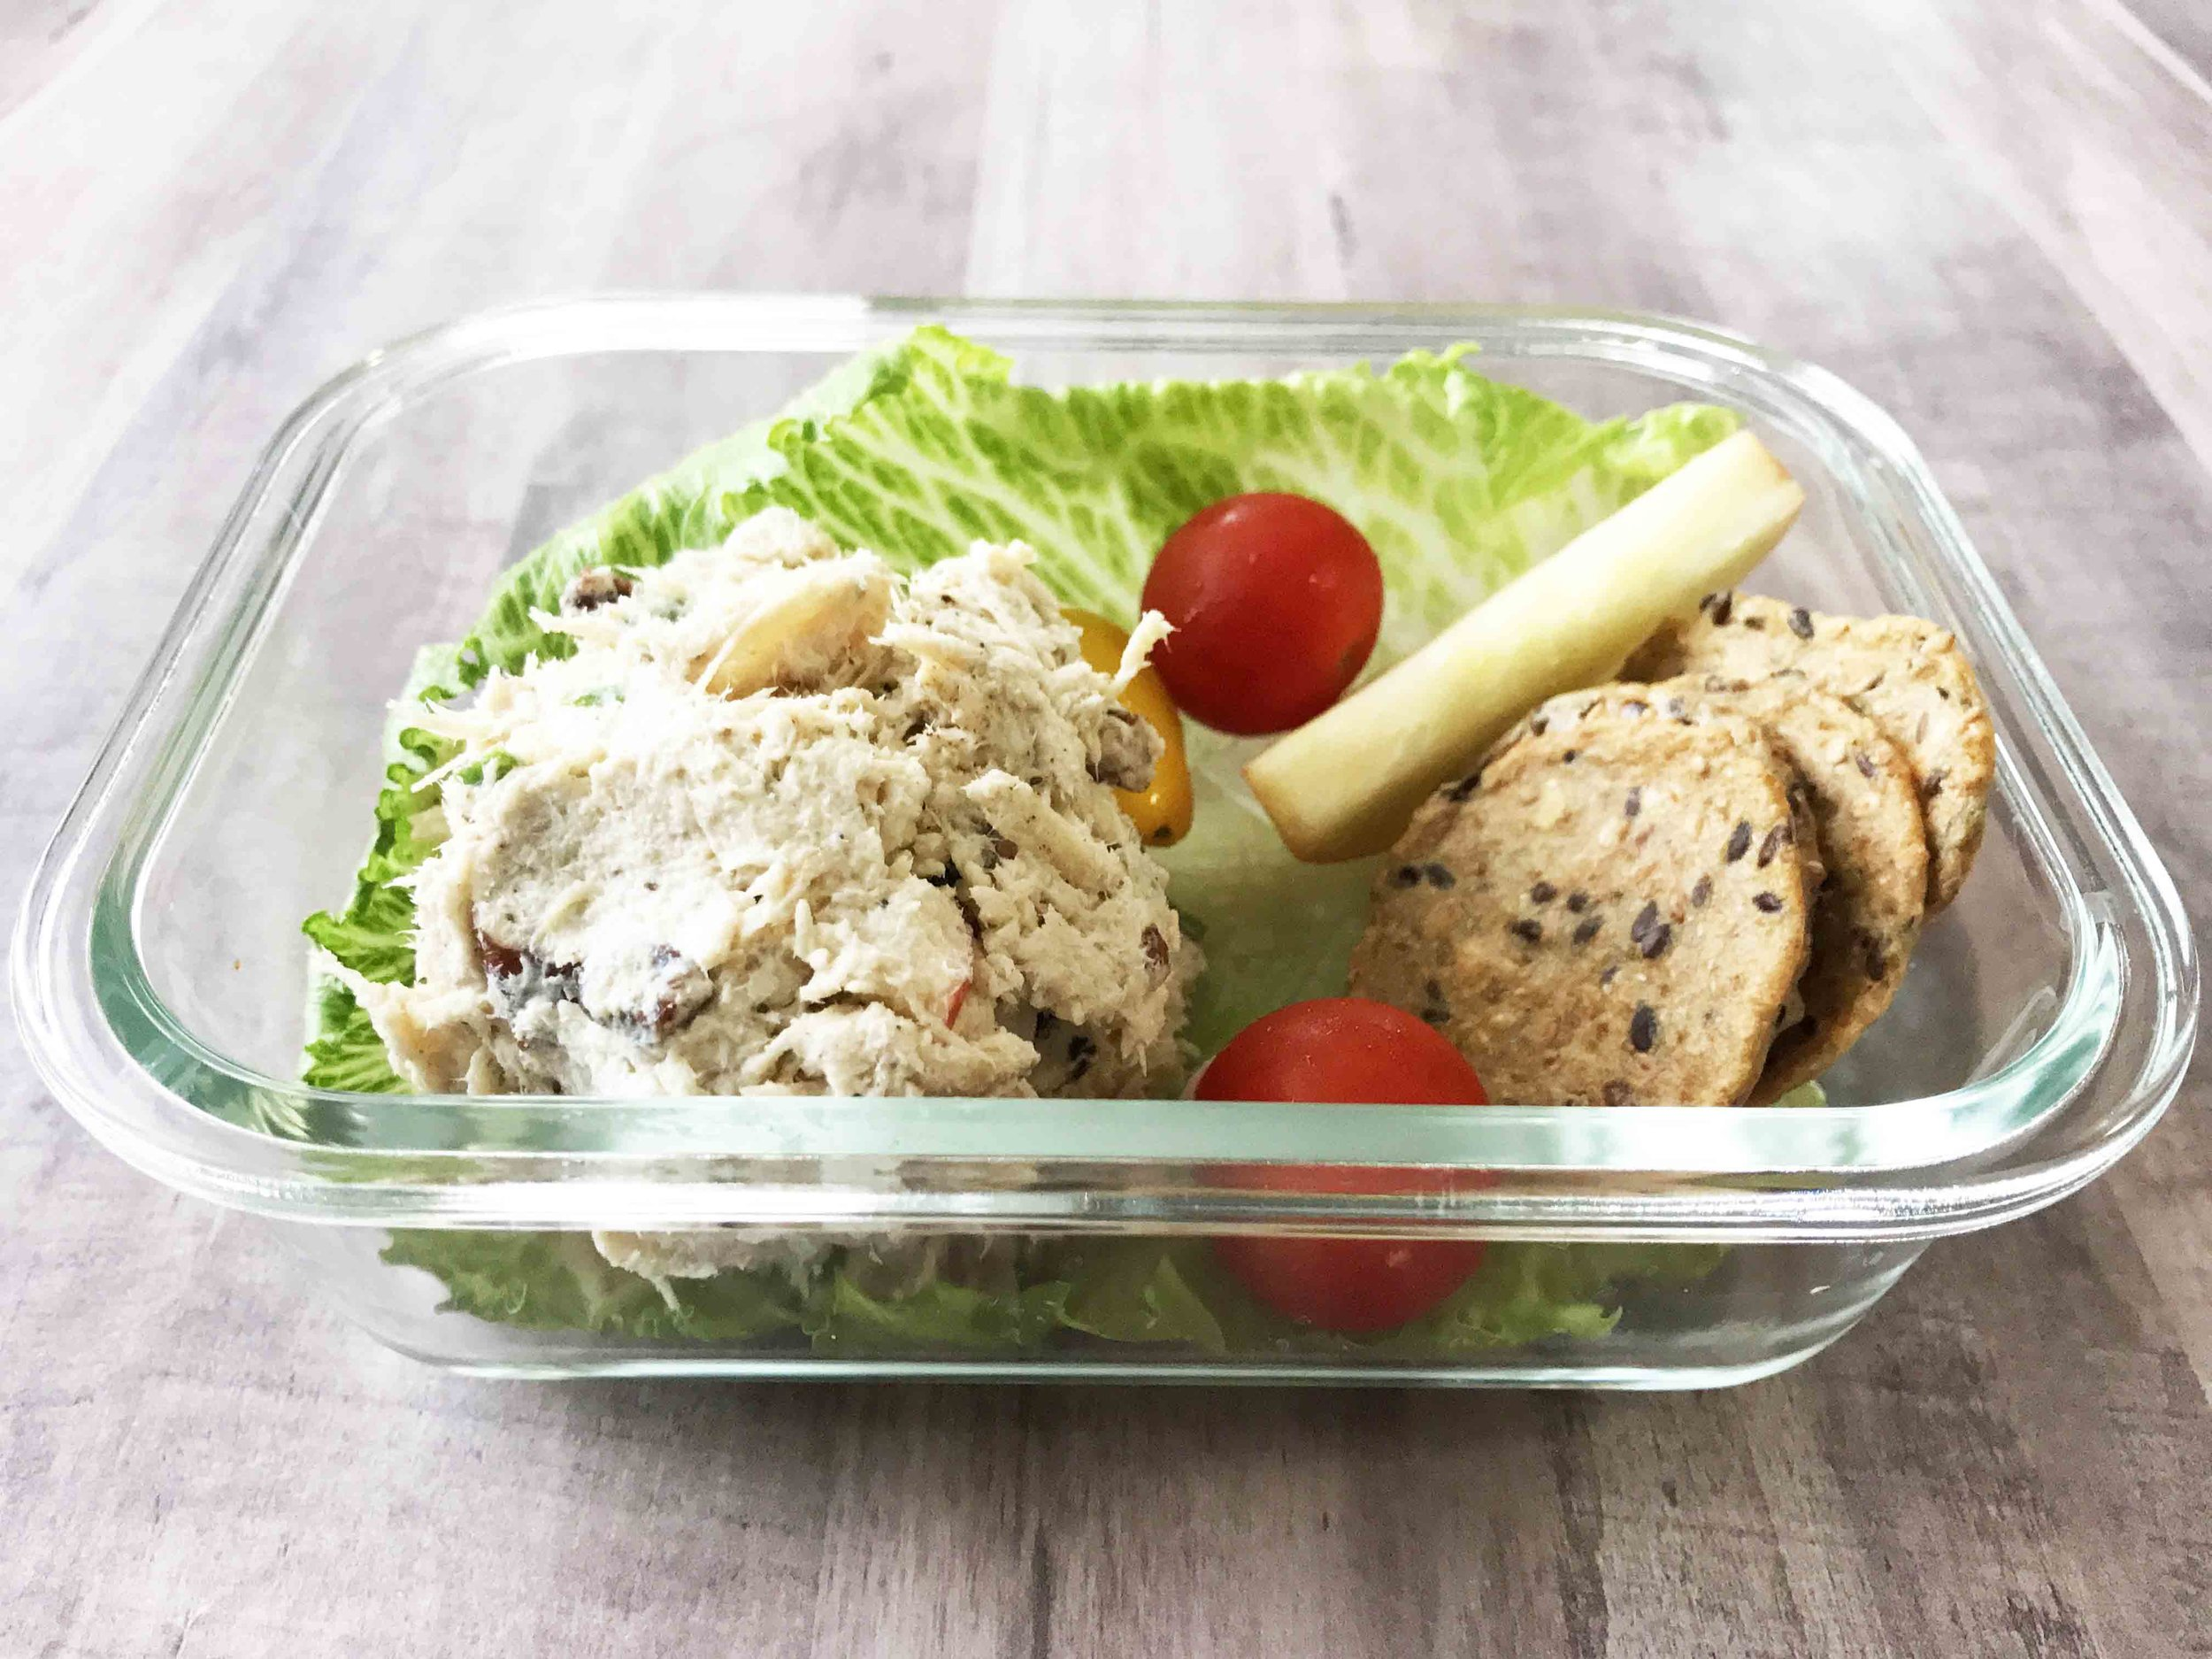 chicken-salad-lunch-box4.jpg